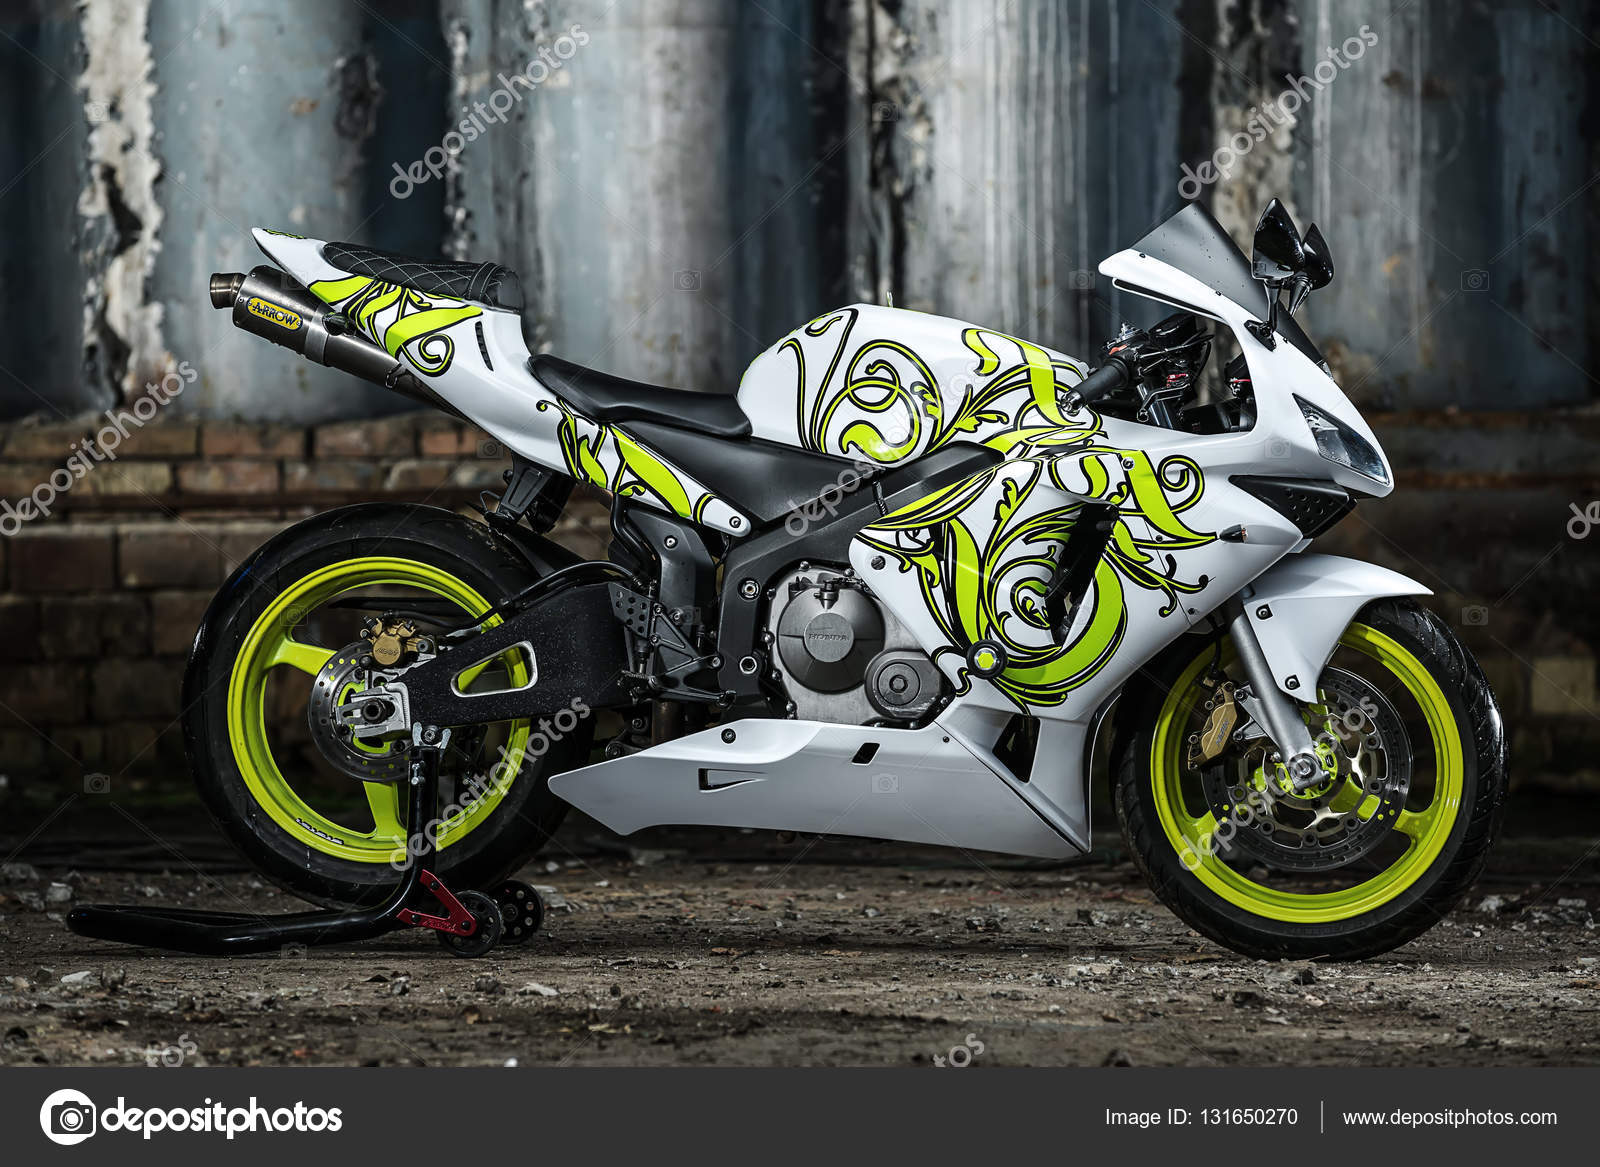 Honda sport moto tuning fotografia de stock editorial bezikus 131650270 - Image moto sportive ...